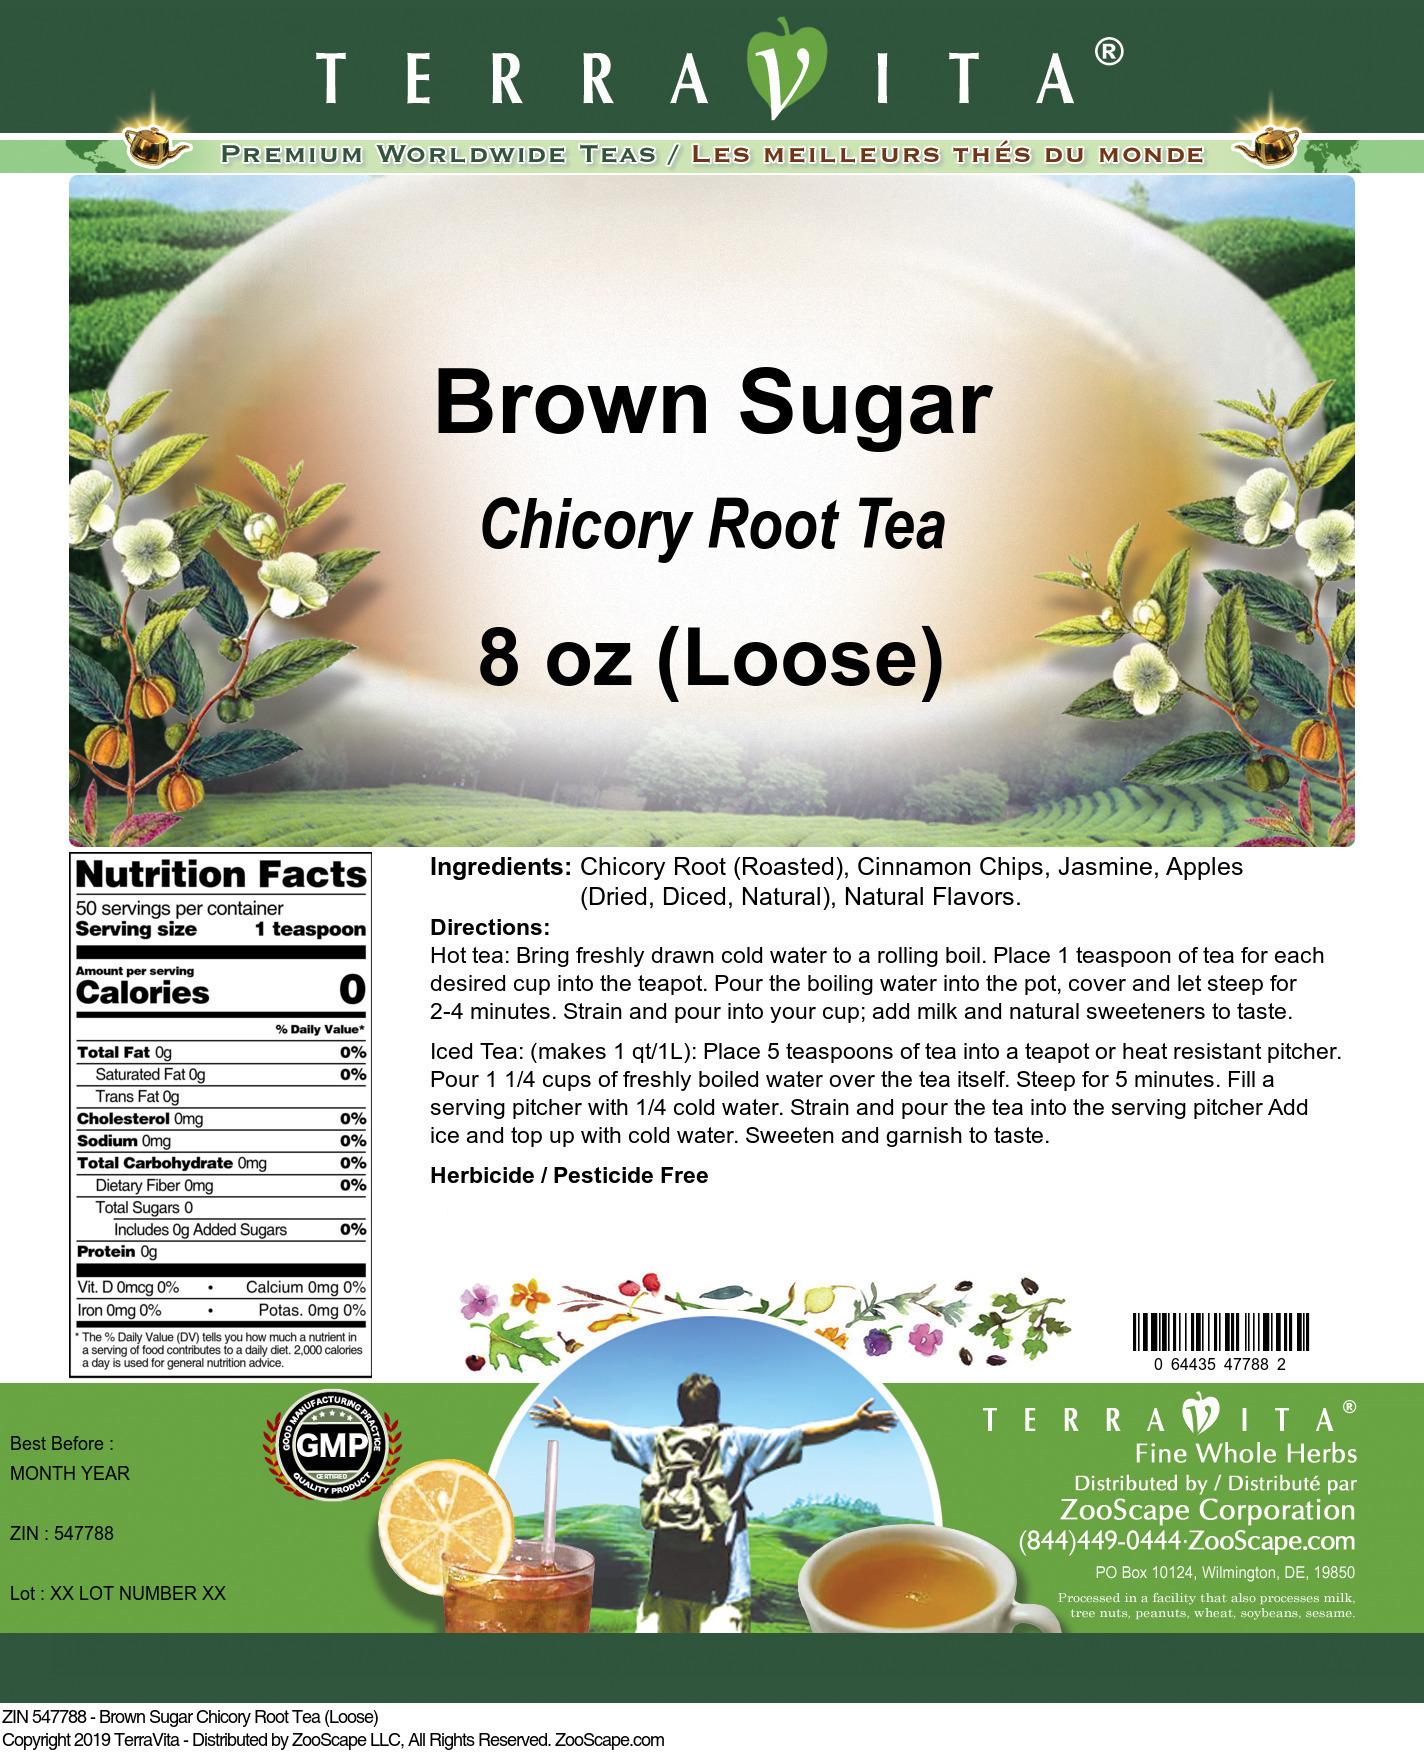 Brown Sugar Chicory Root Tea (Loose)